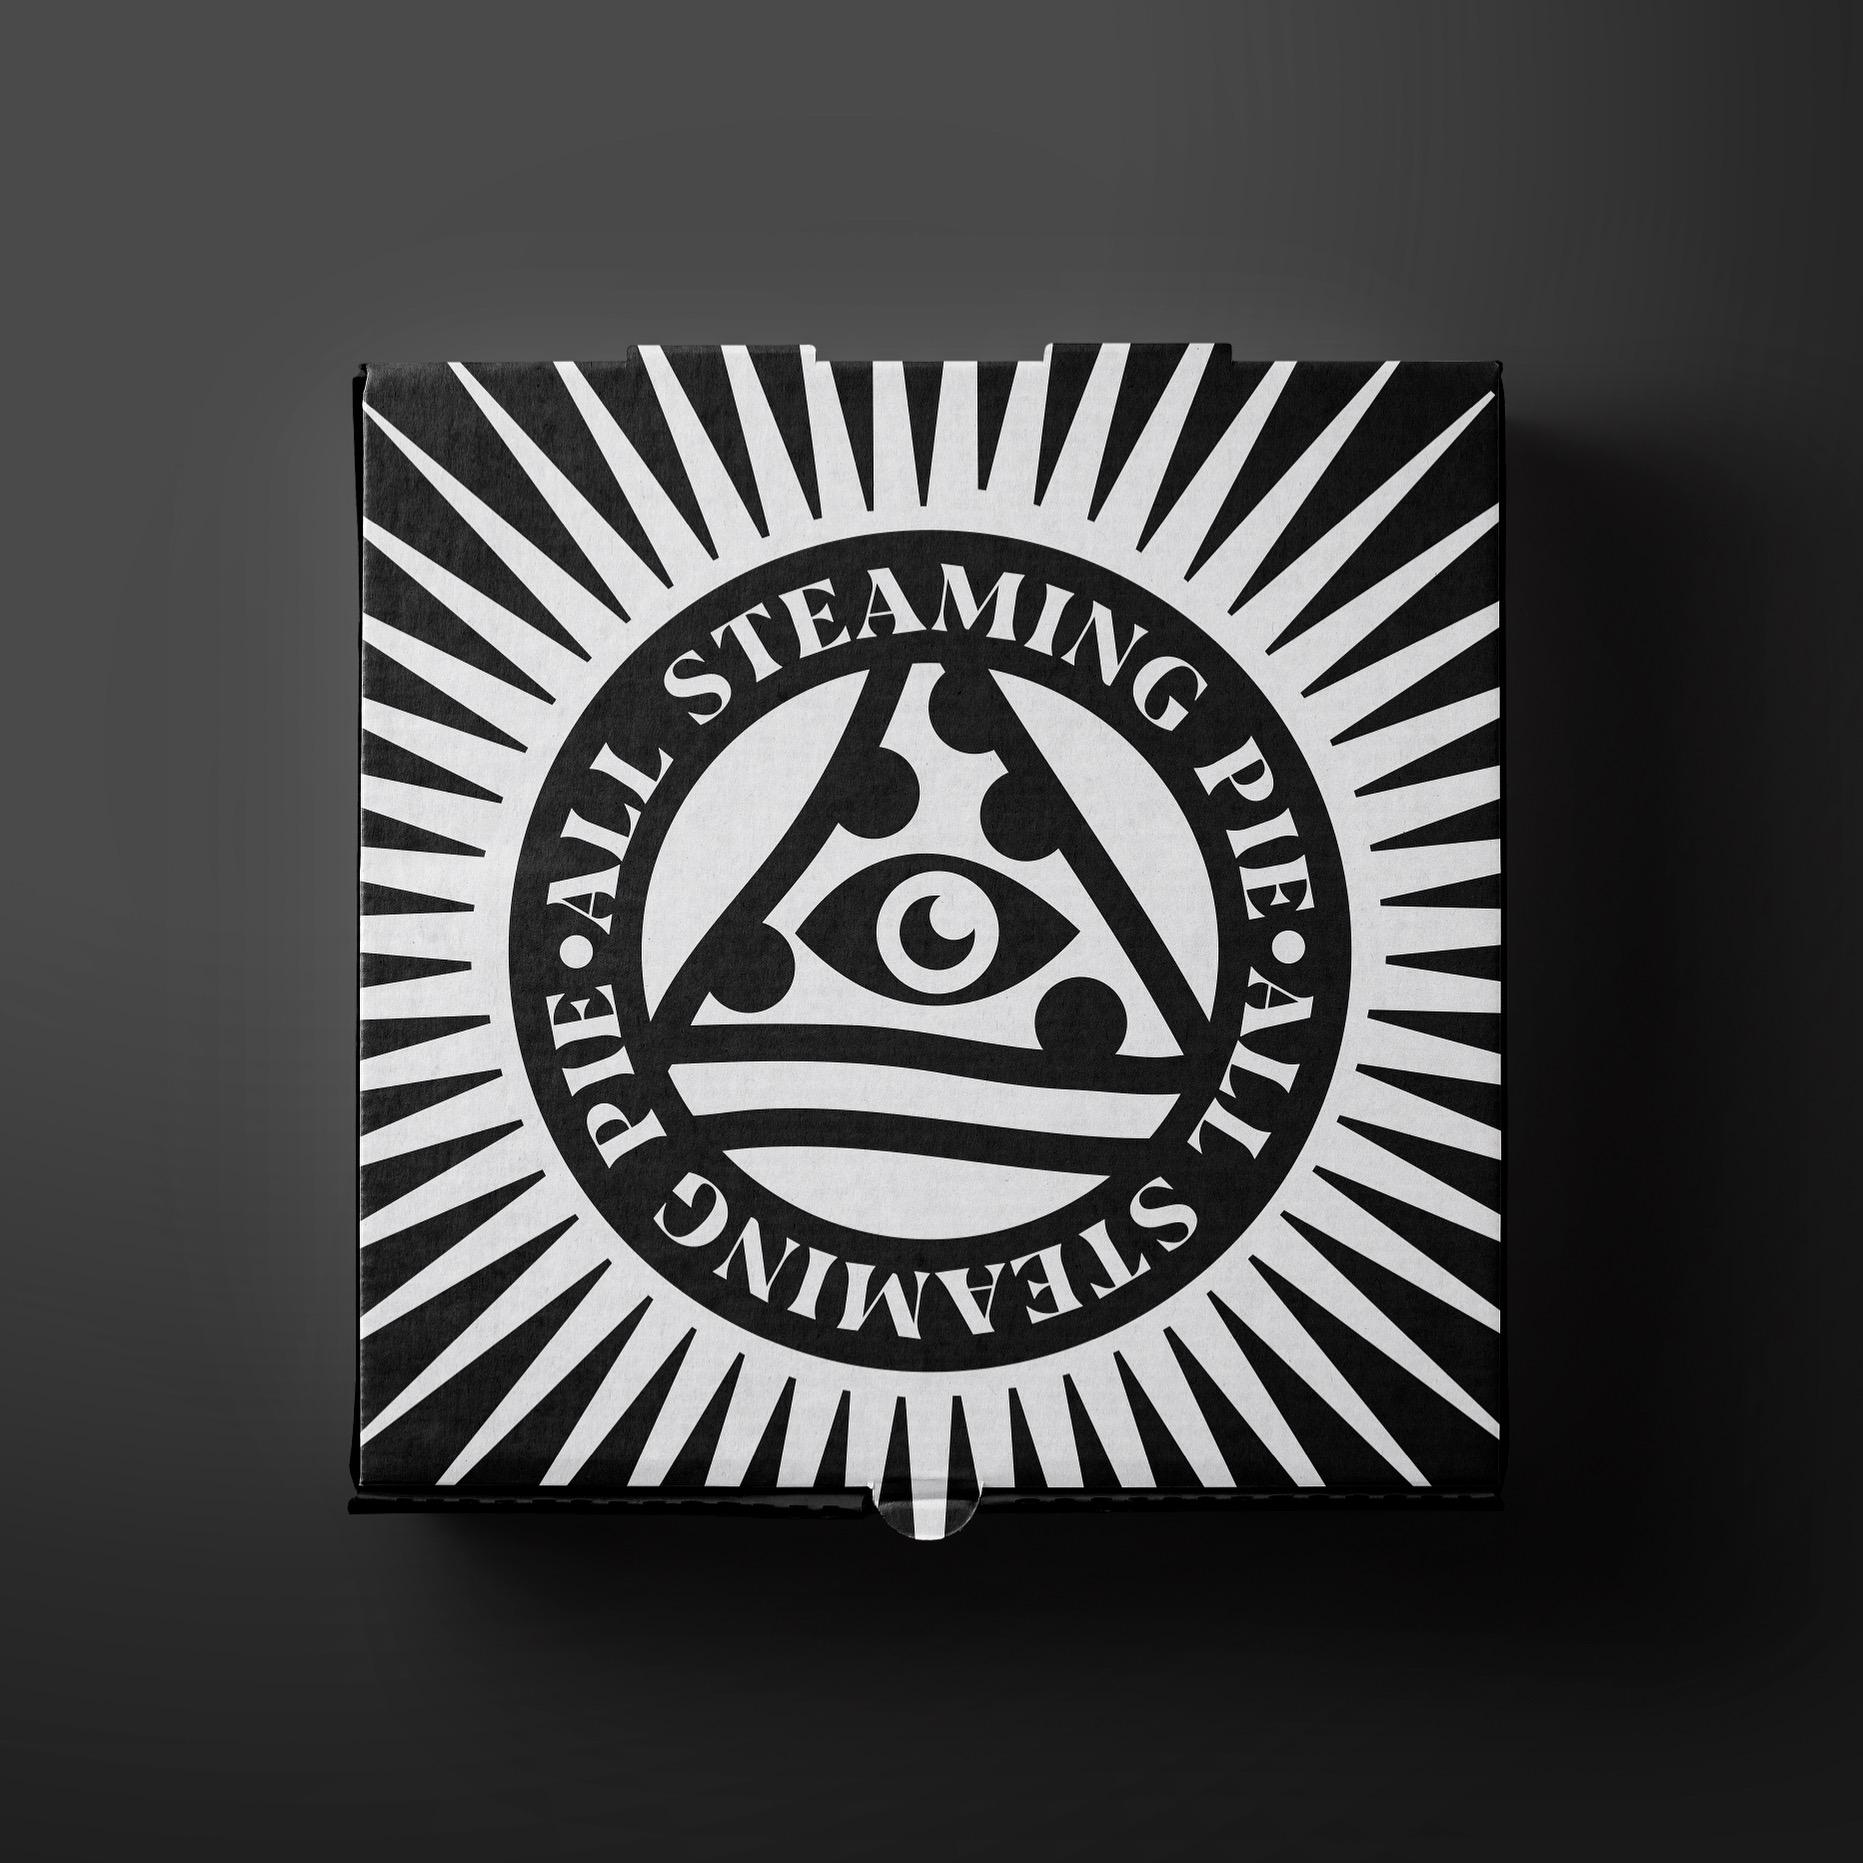 Illuminati Pizza and The All Steaming Pie Concept